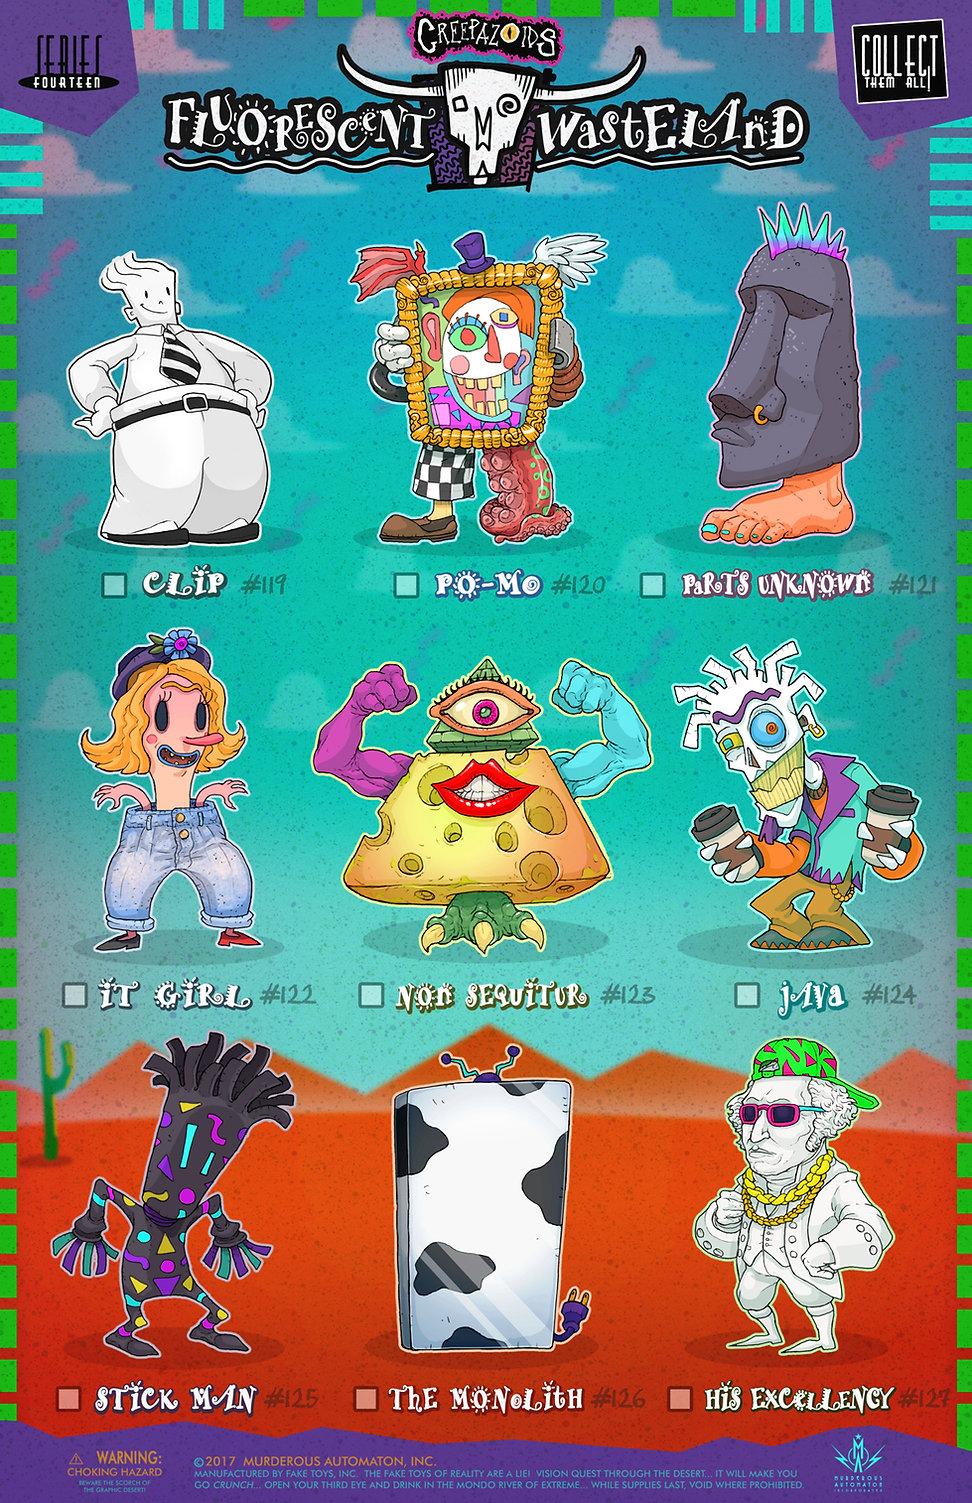 14 Creepazoids--Fluorescent Wasteland.jp